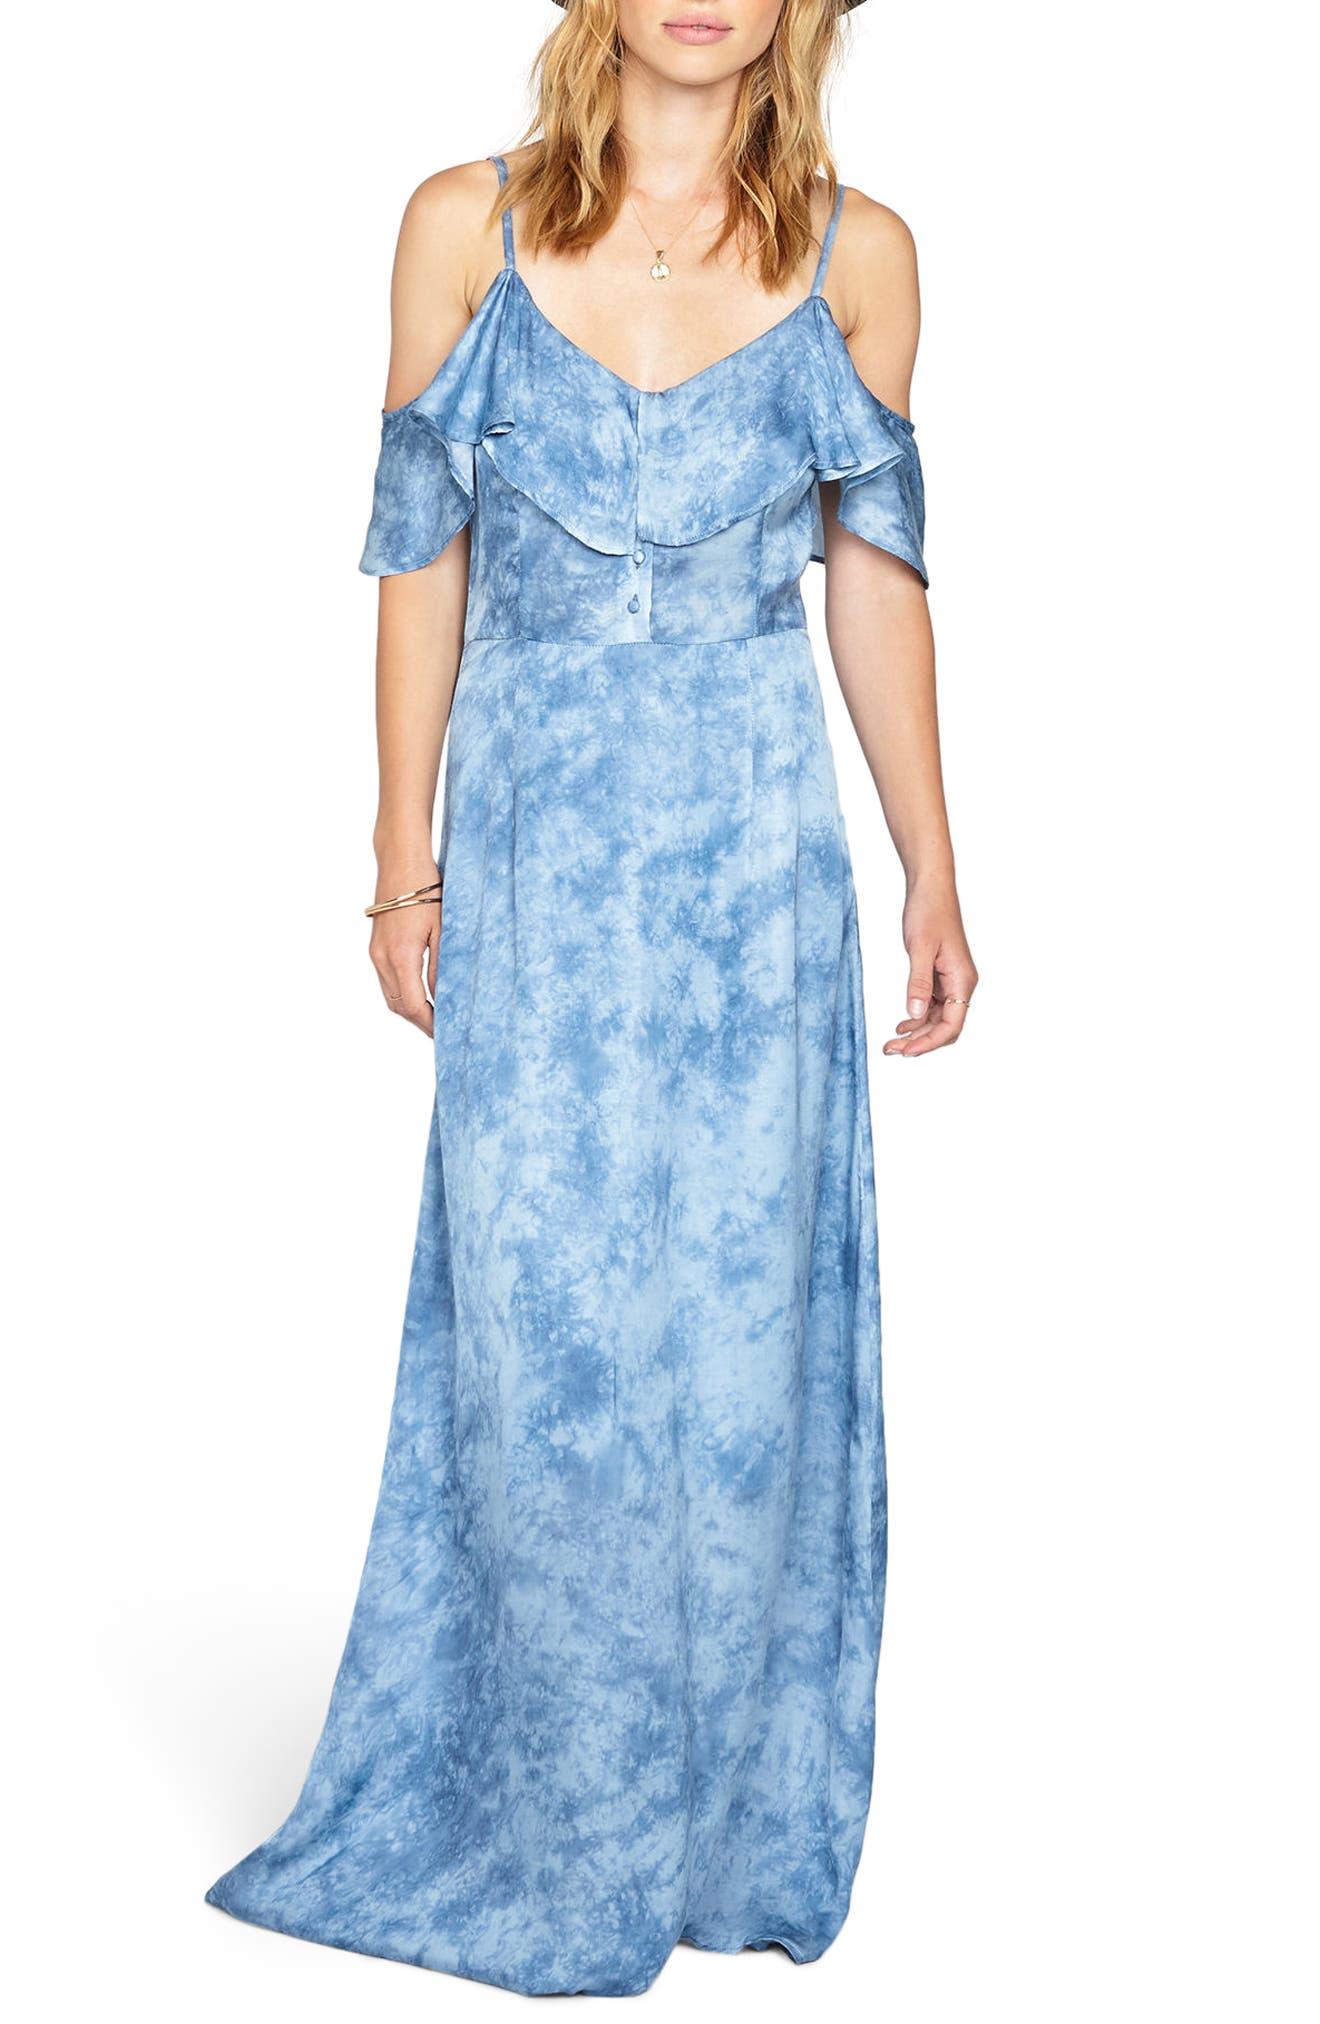 Lost Paradise Off the Shoulder Maxi Dress,                         Main,                         color, 426